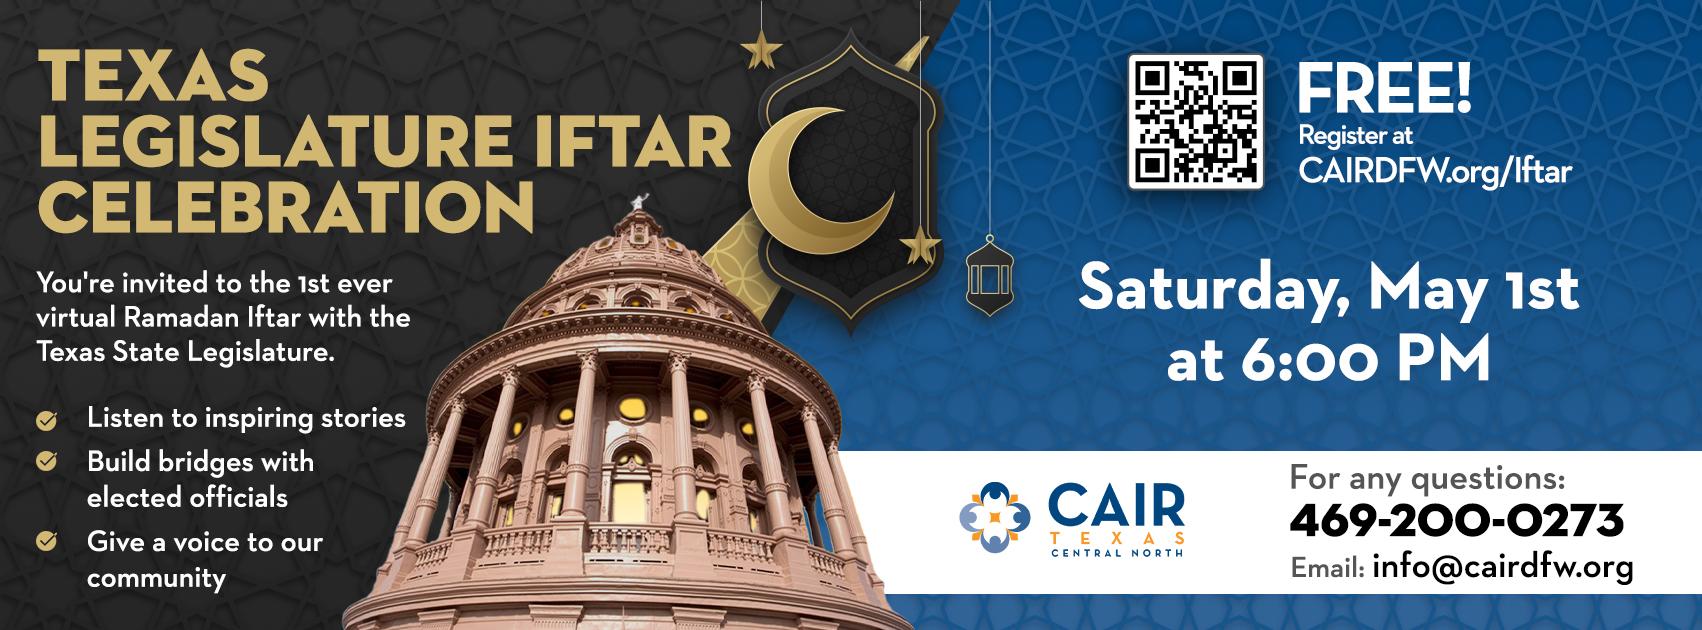 Registration for TX Legislature Iftar Celebration